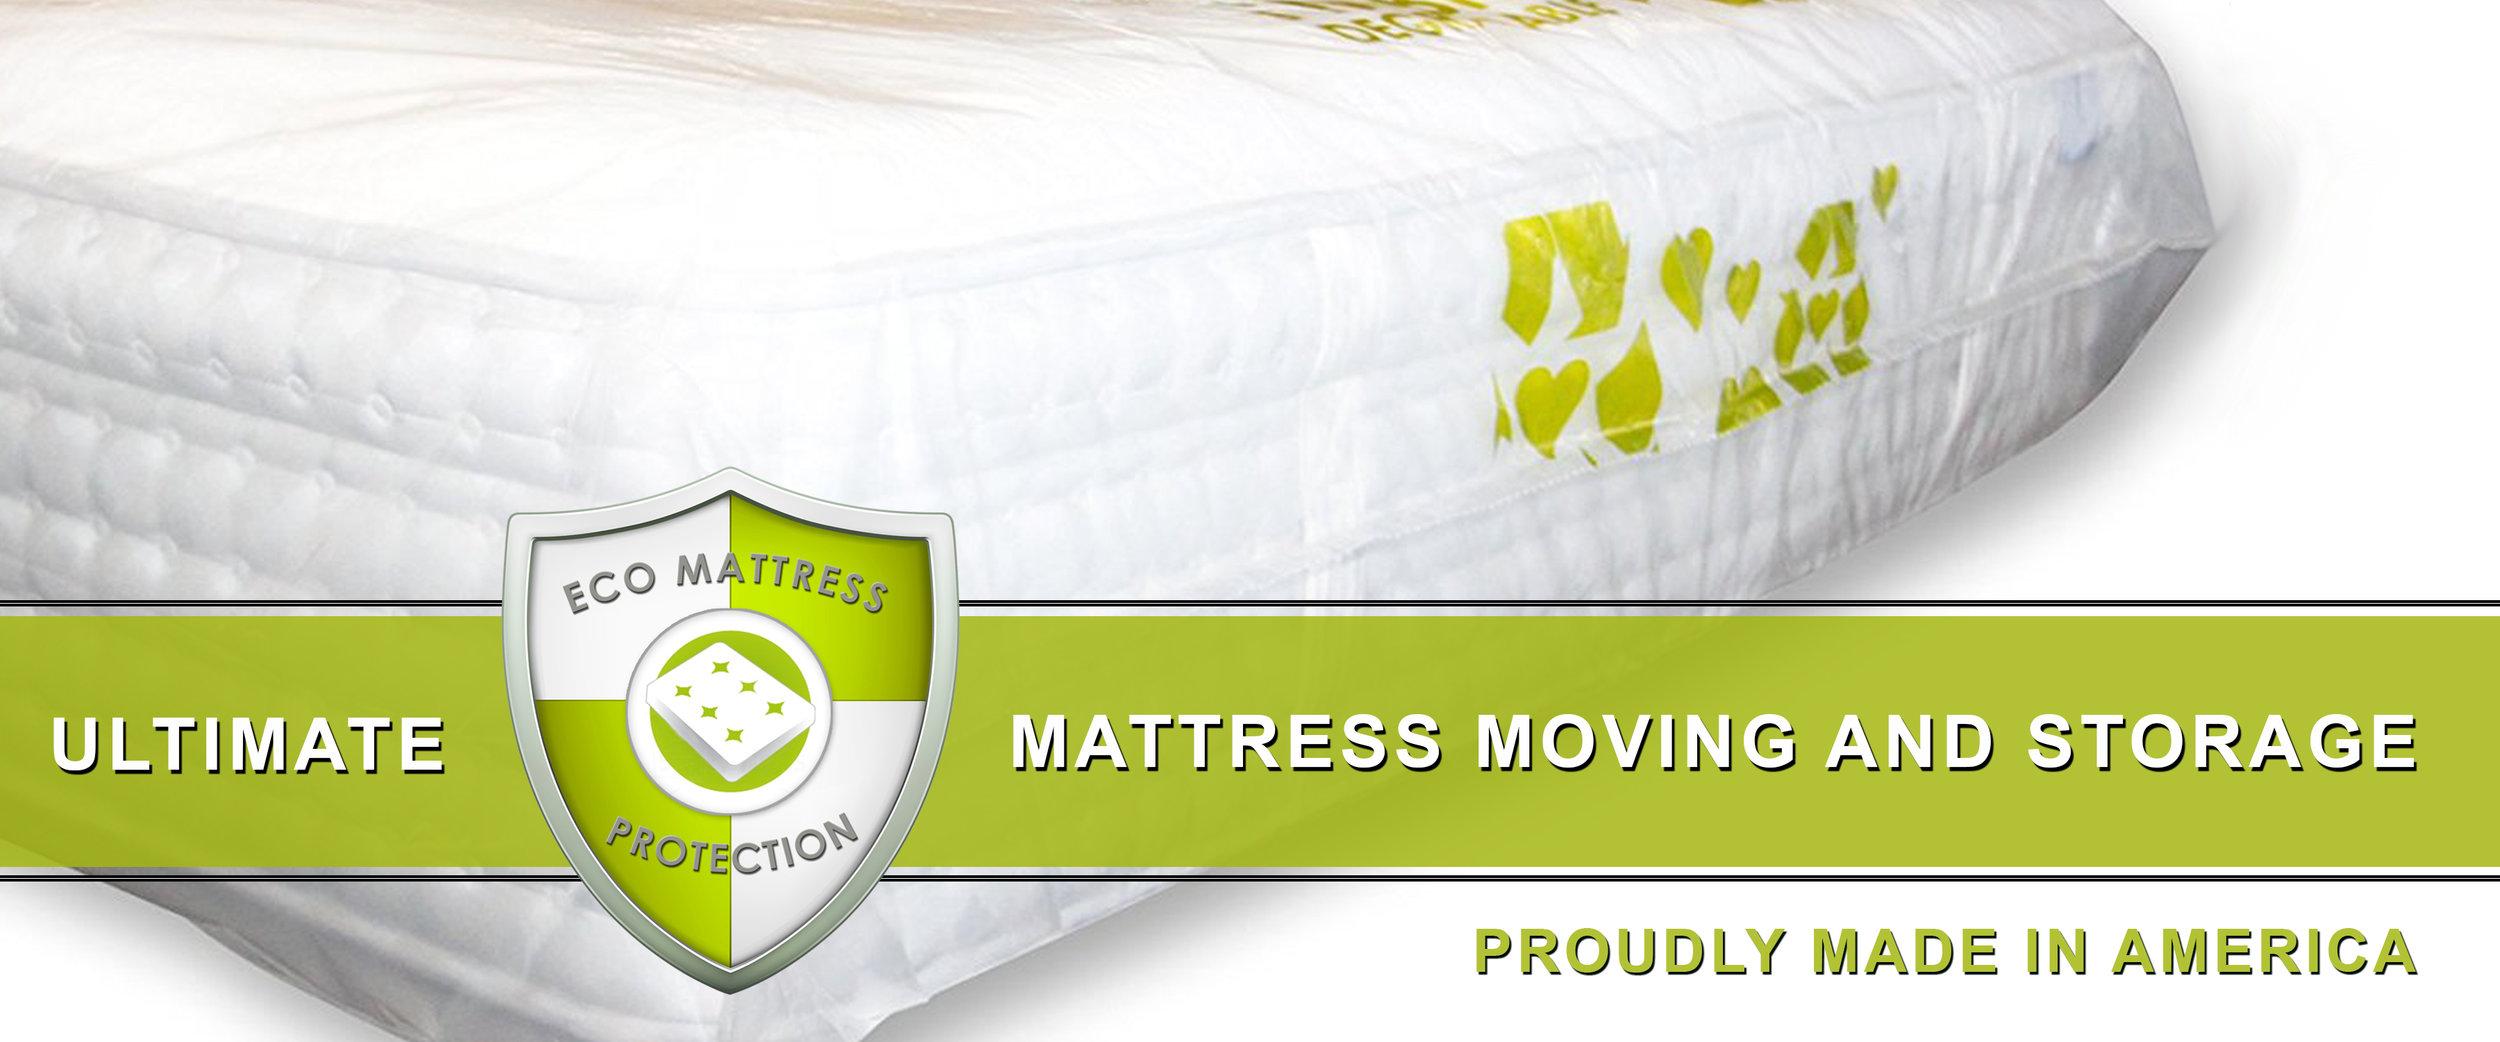 Mattress Moving and Storage.jpg